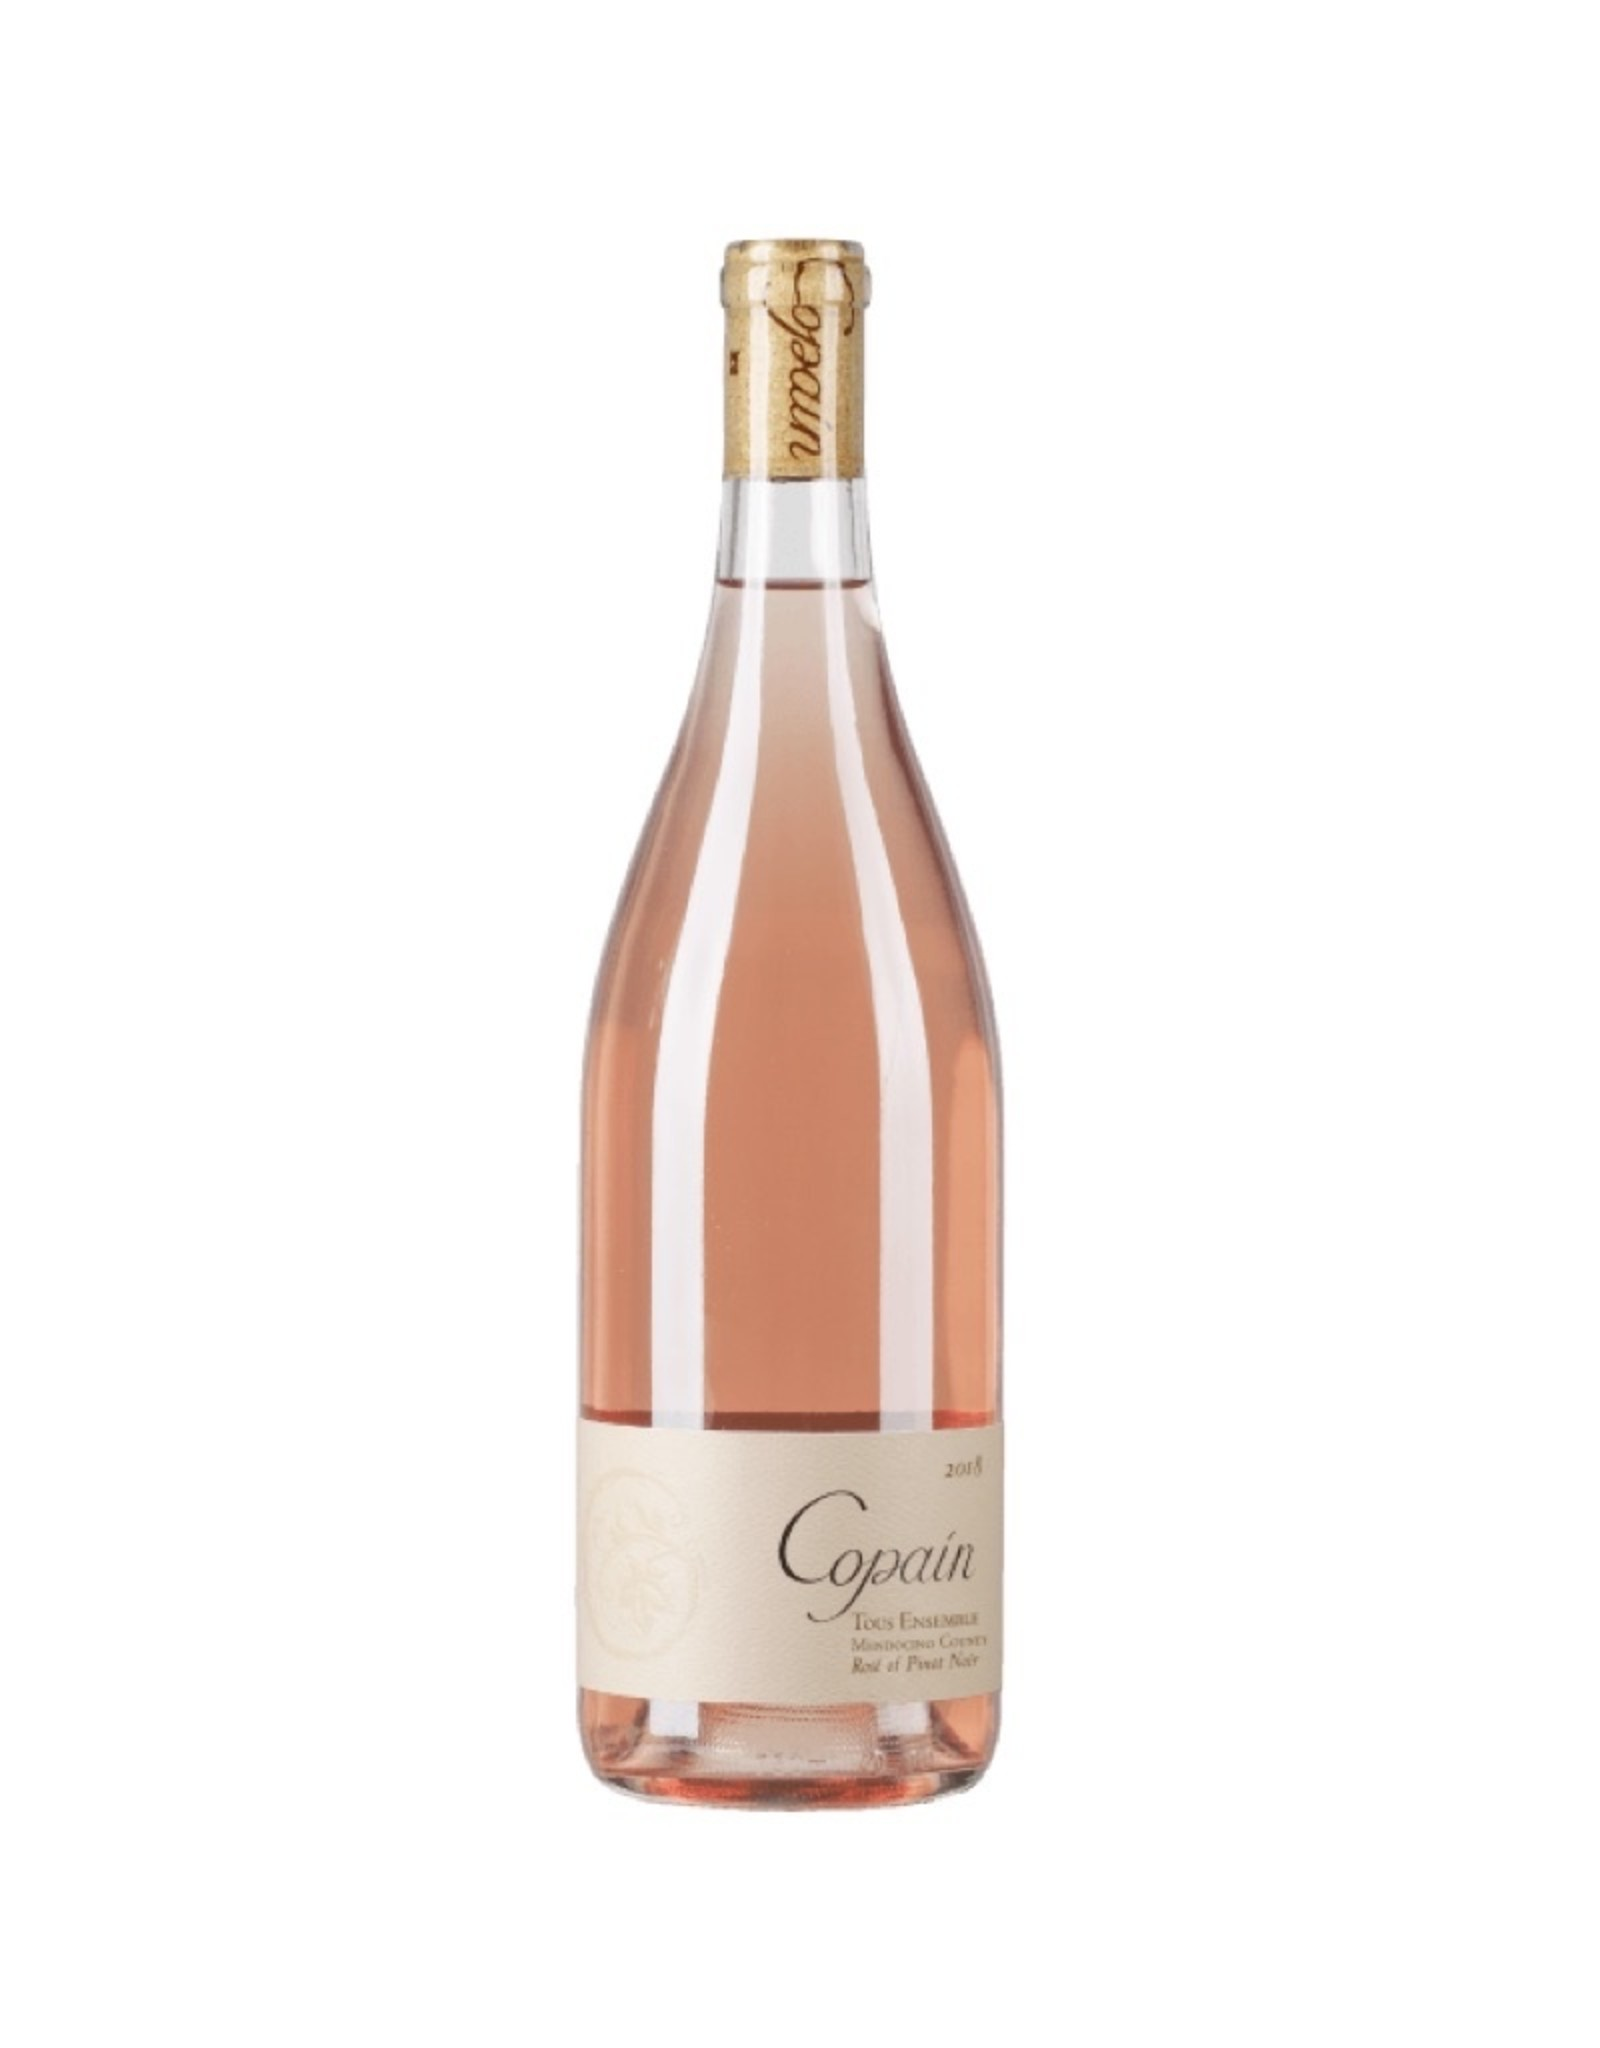 Copain Wines Rose, Tous Ensemble, Anderson Valley, 2019